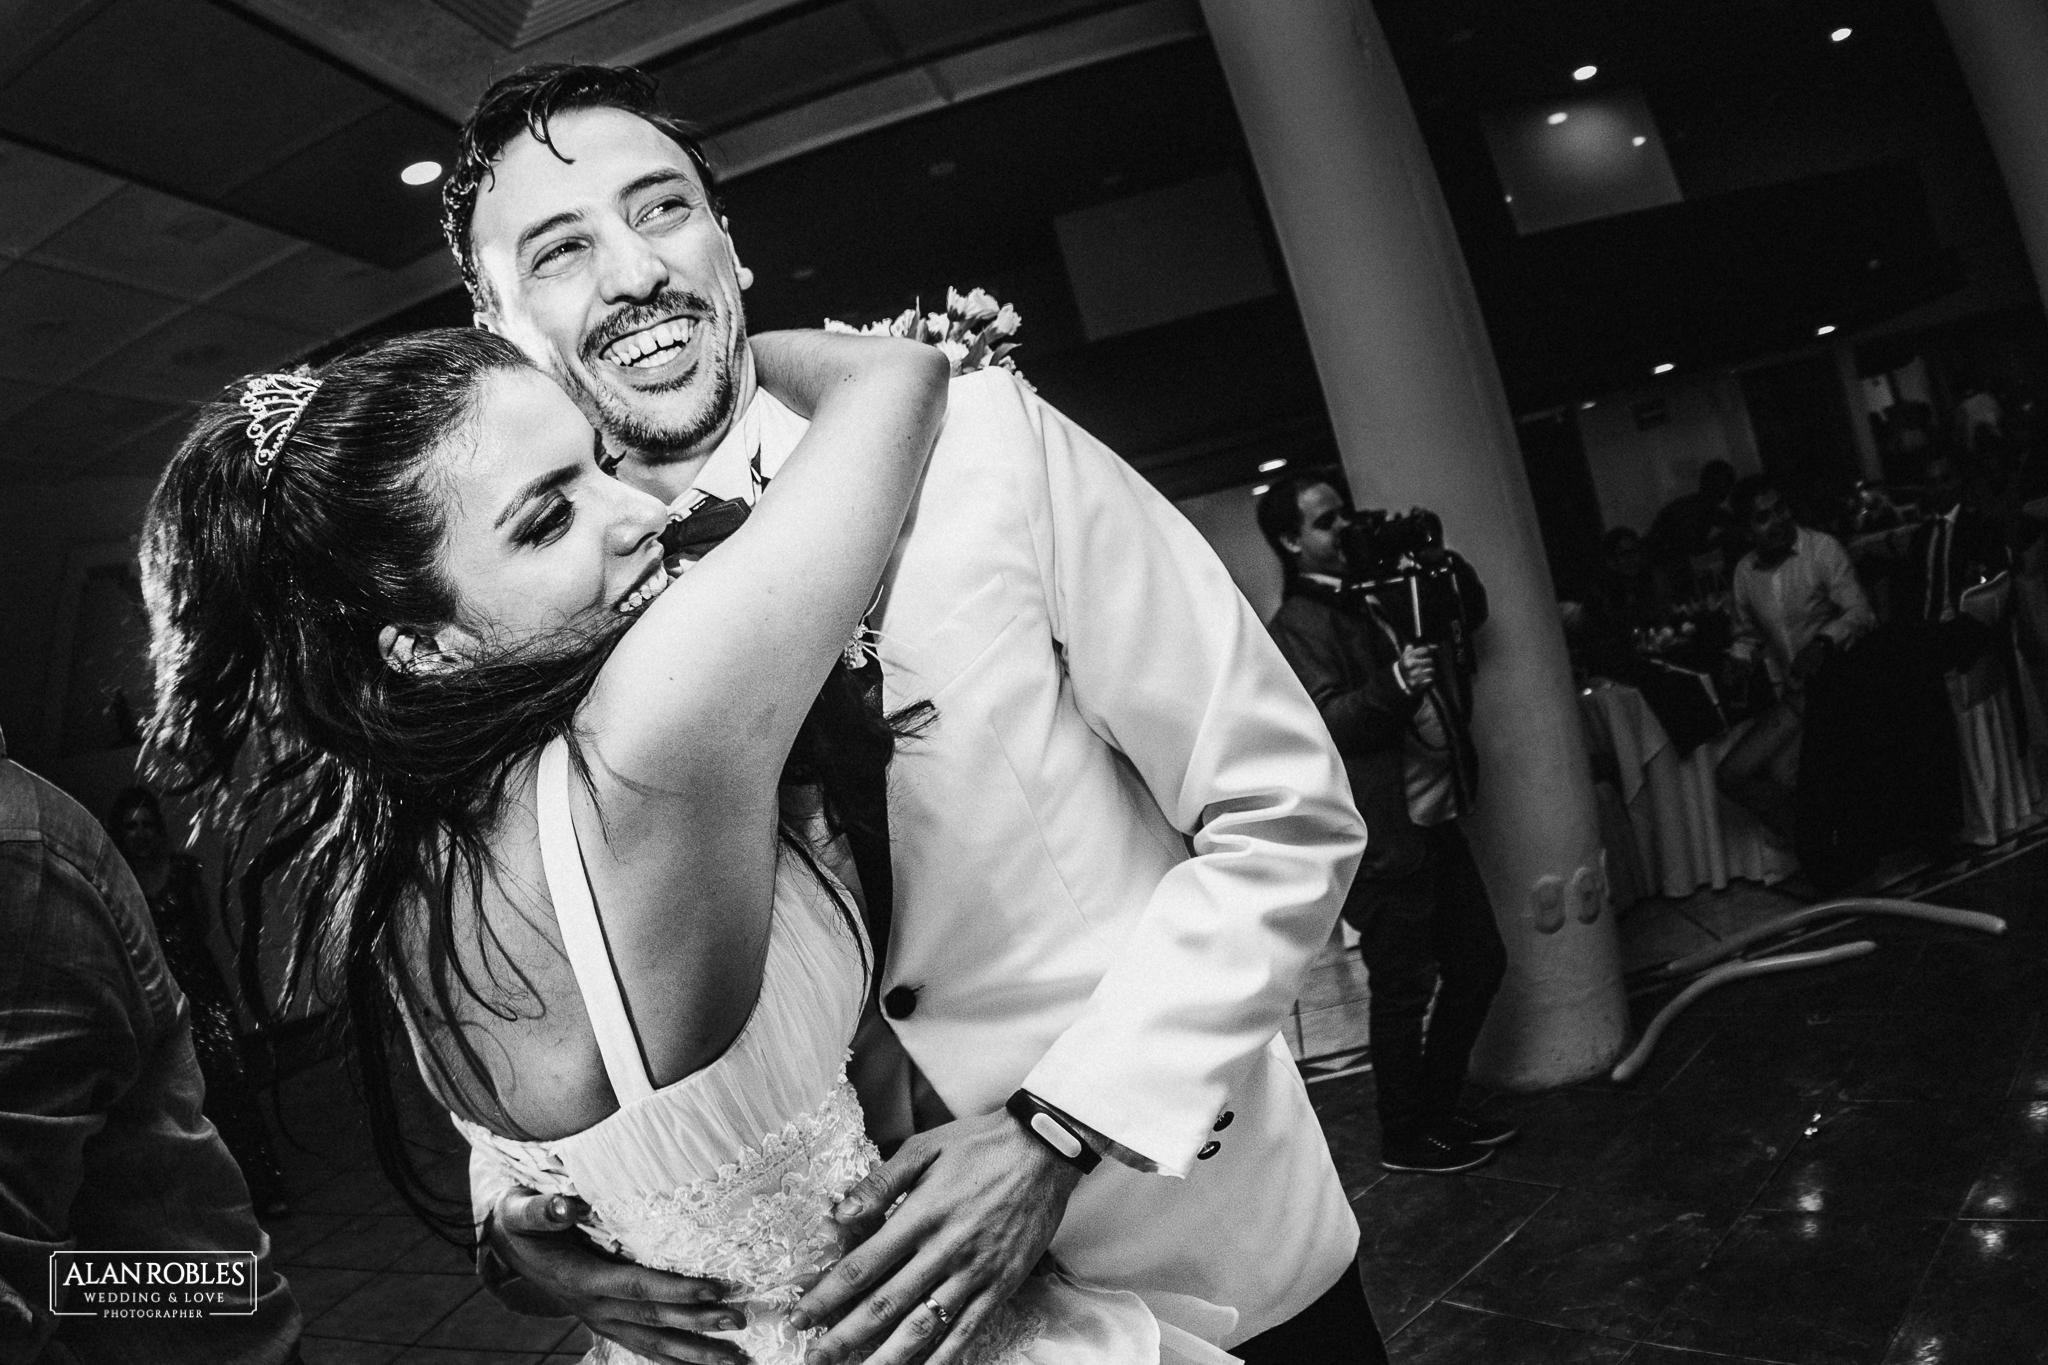 Fotografo de bodas Alan Robles. Fotografia documental en bodas. El mejor fotografo en Guadalajara.